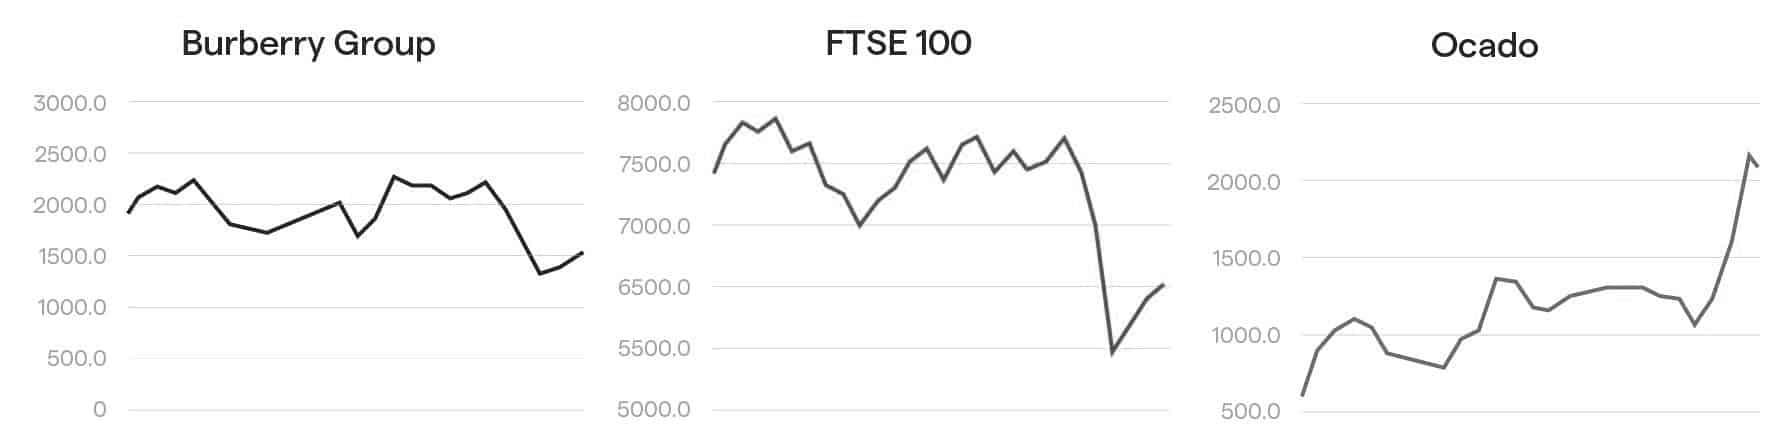 циклические акции, Burberry, Ocado, FTSE 100